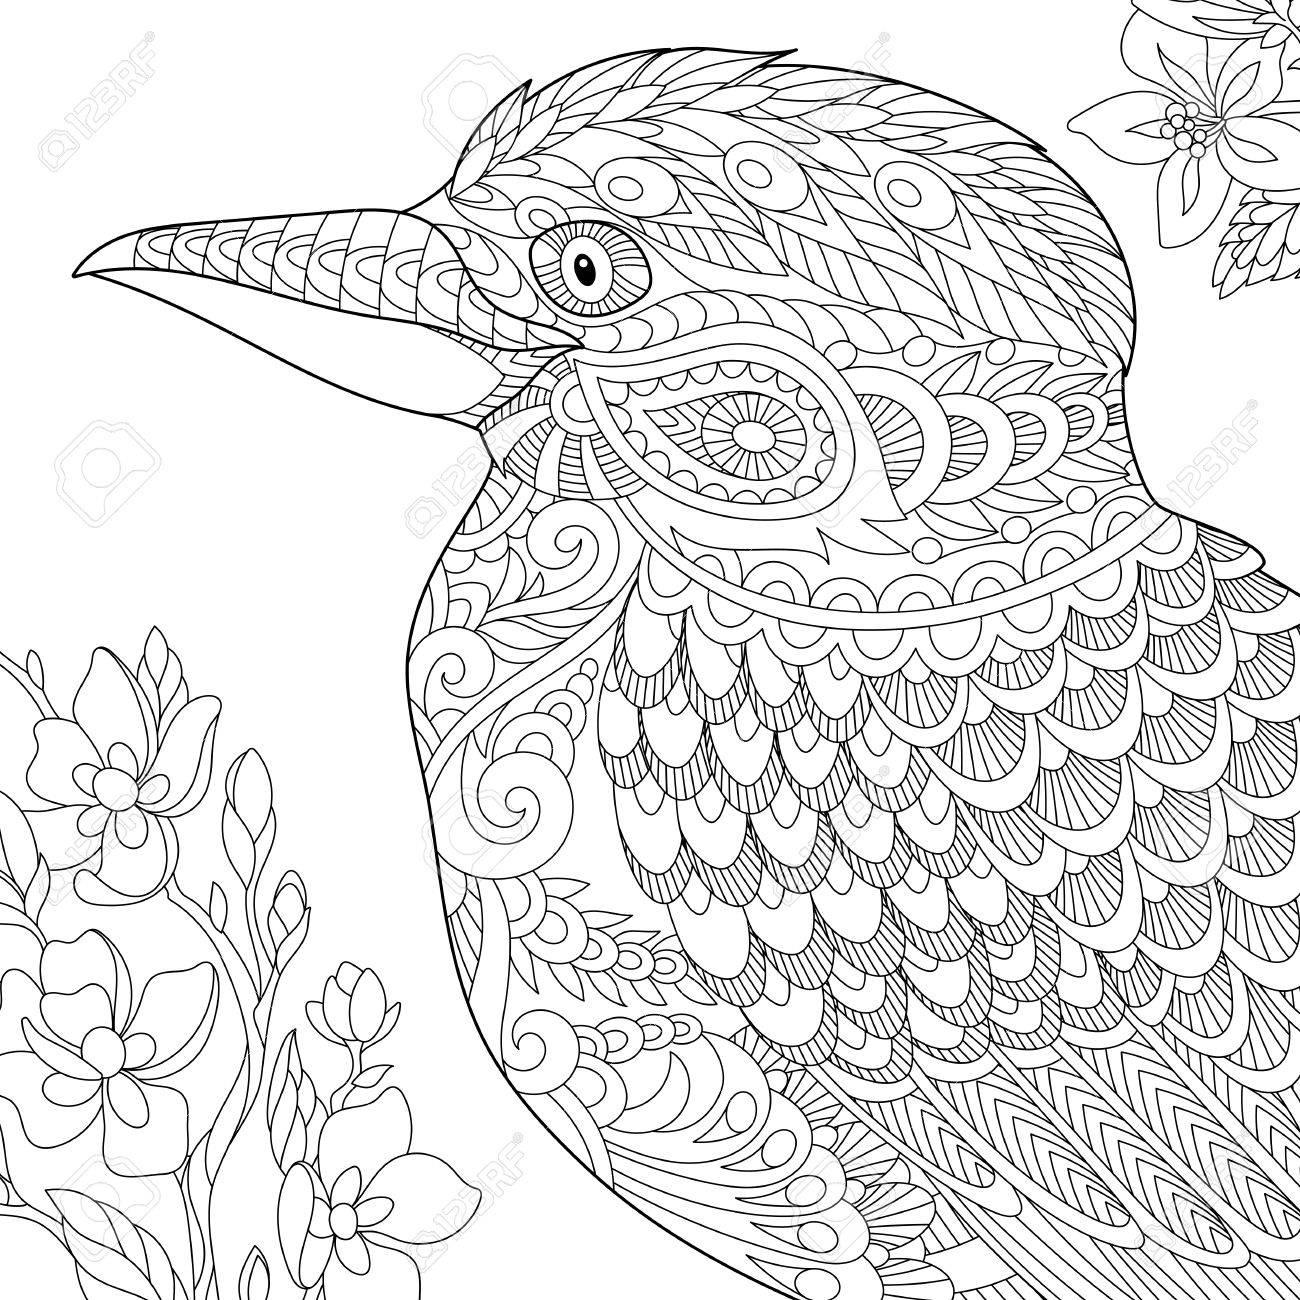 1300x1300 Coloring Page Of Australian Kookaburra Bird. Freehand Sketch